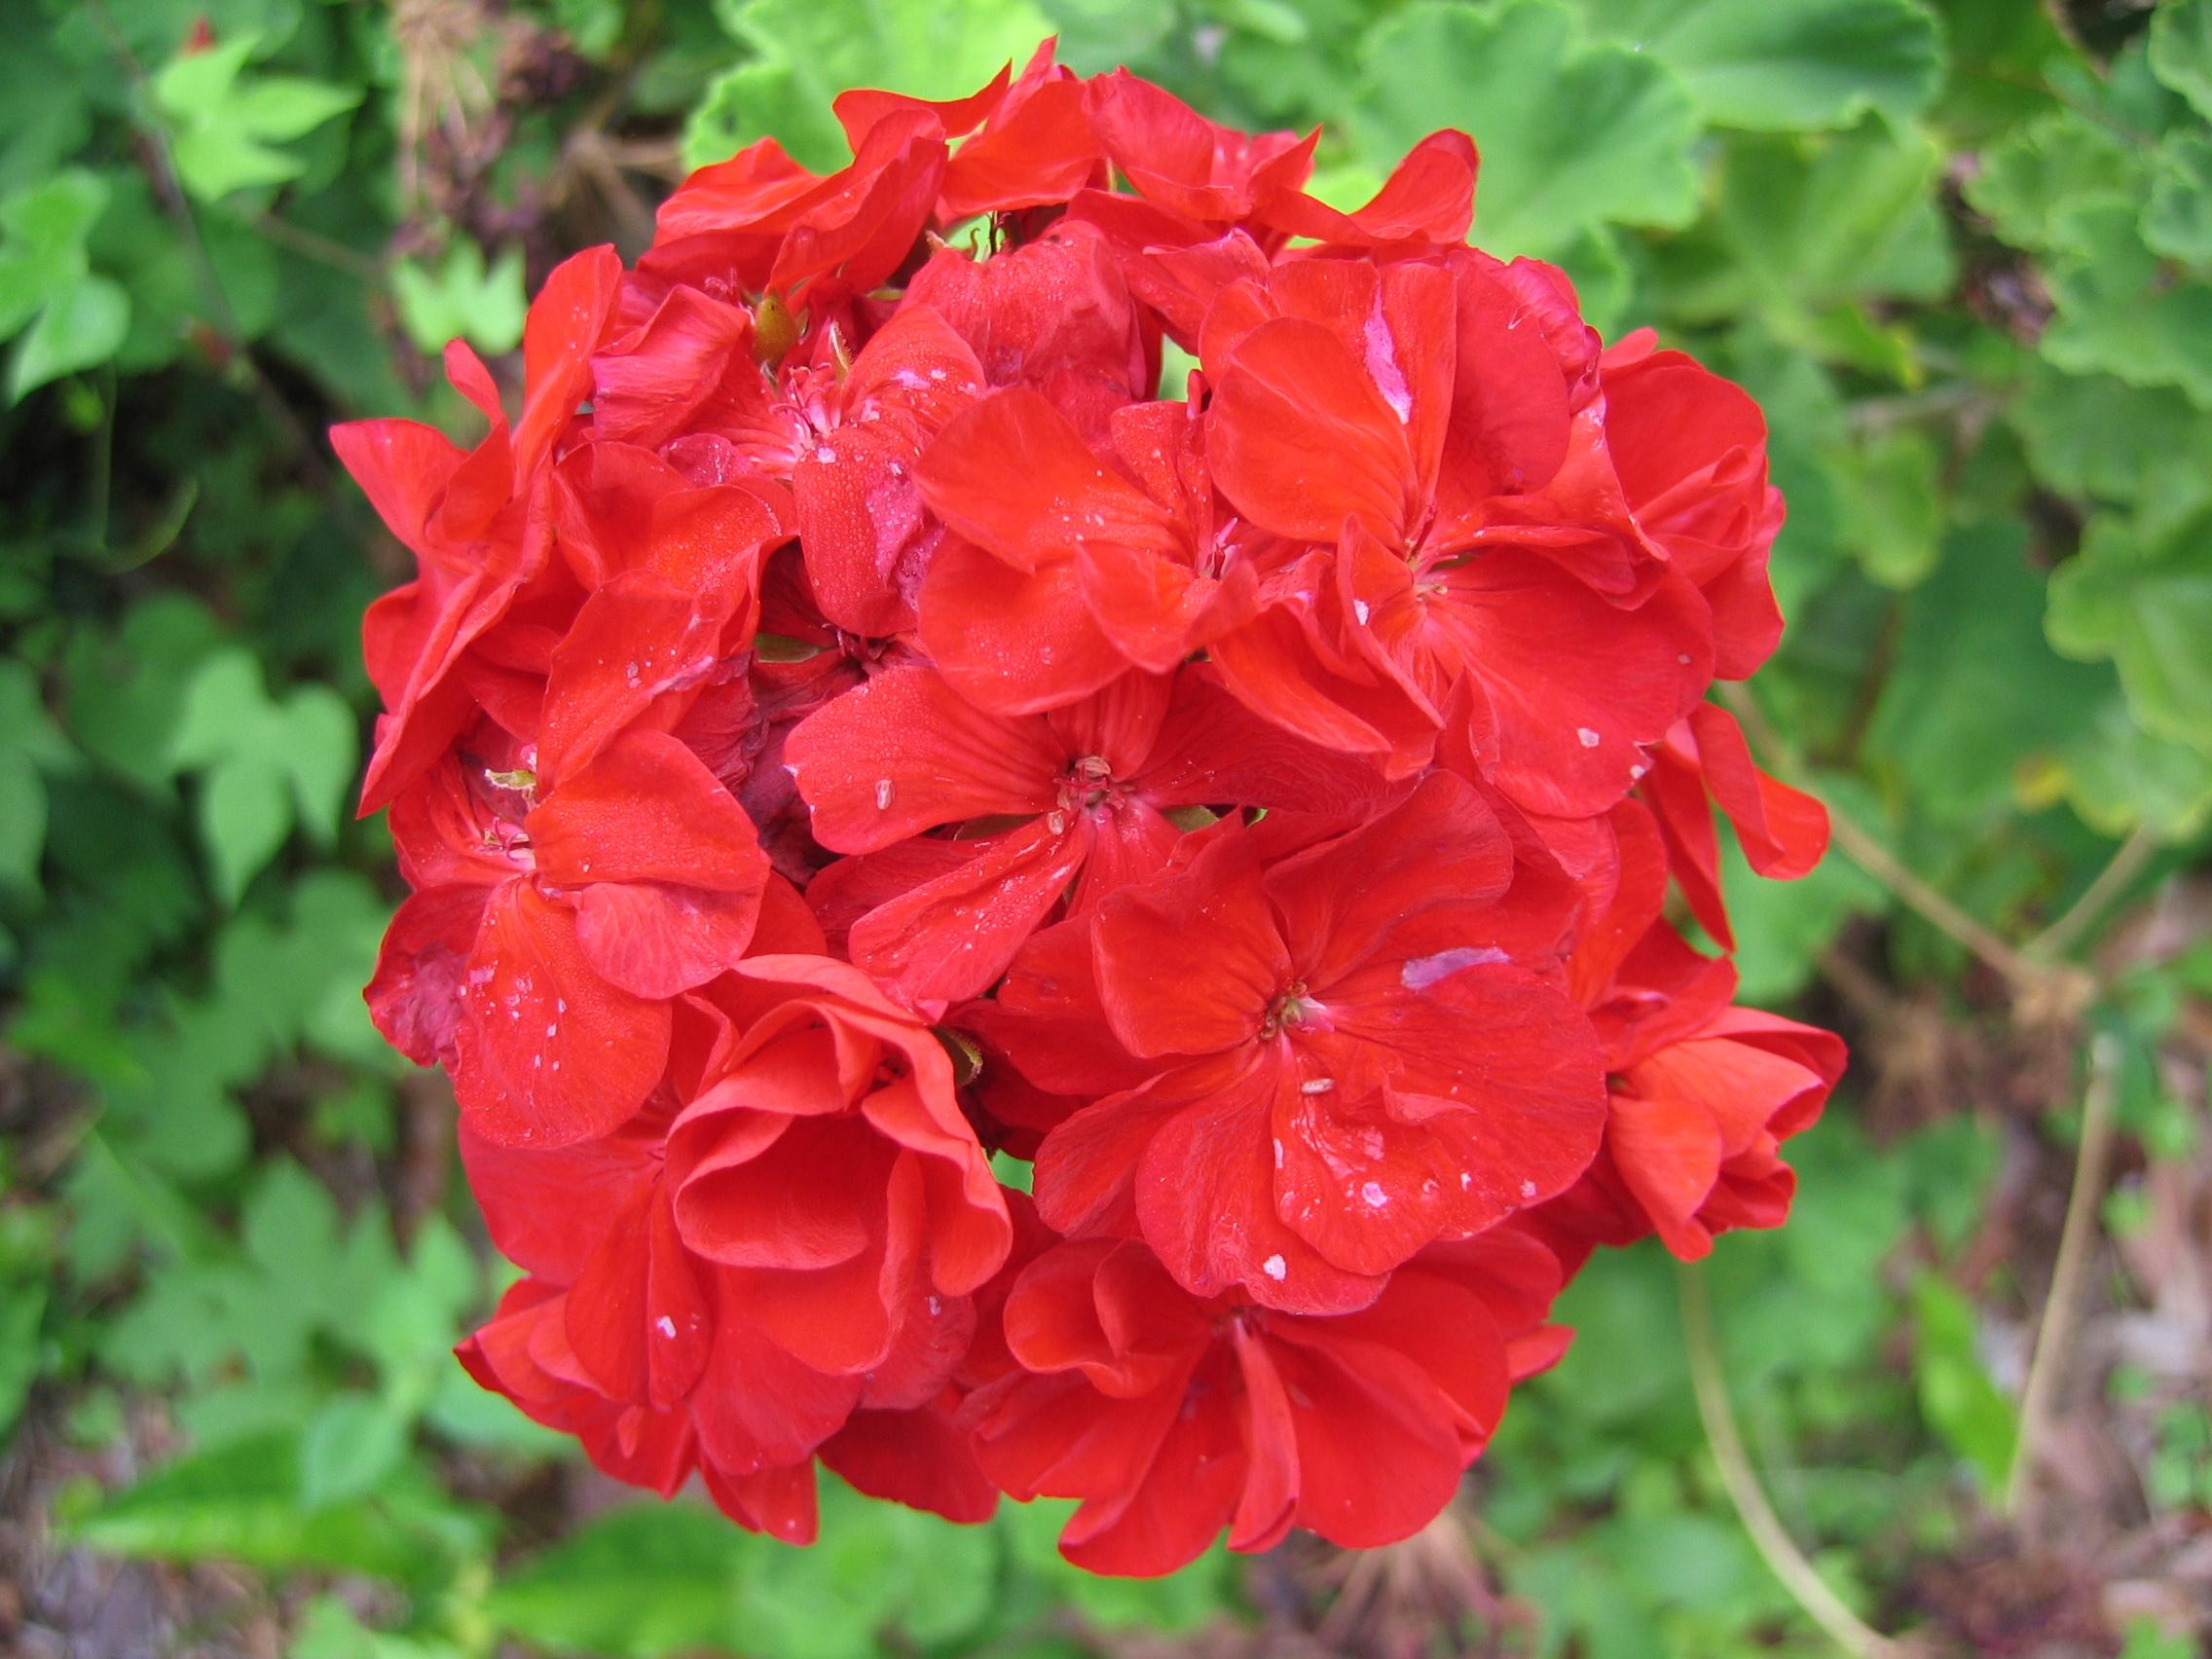 صور ورد جميله Unidentified_Red_Flowers